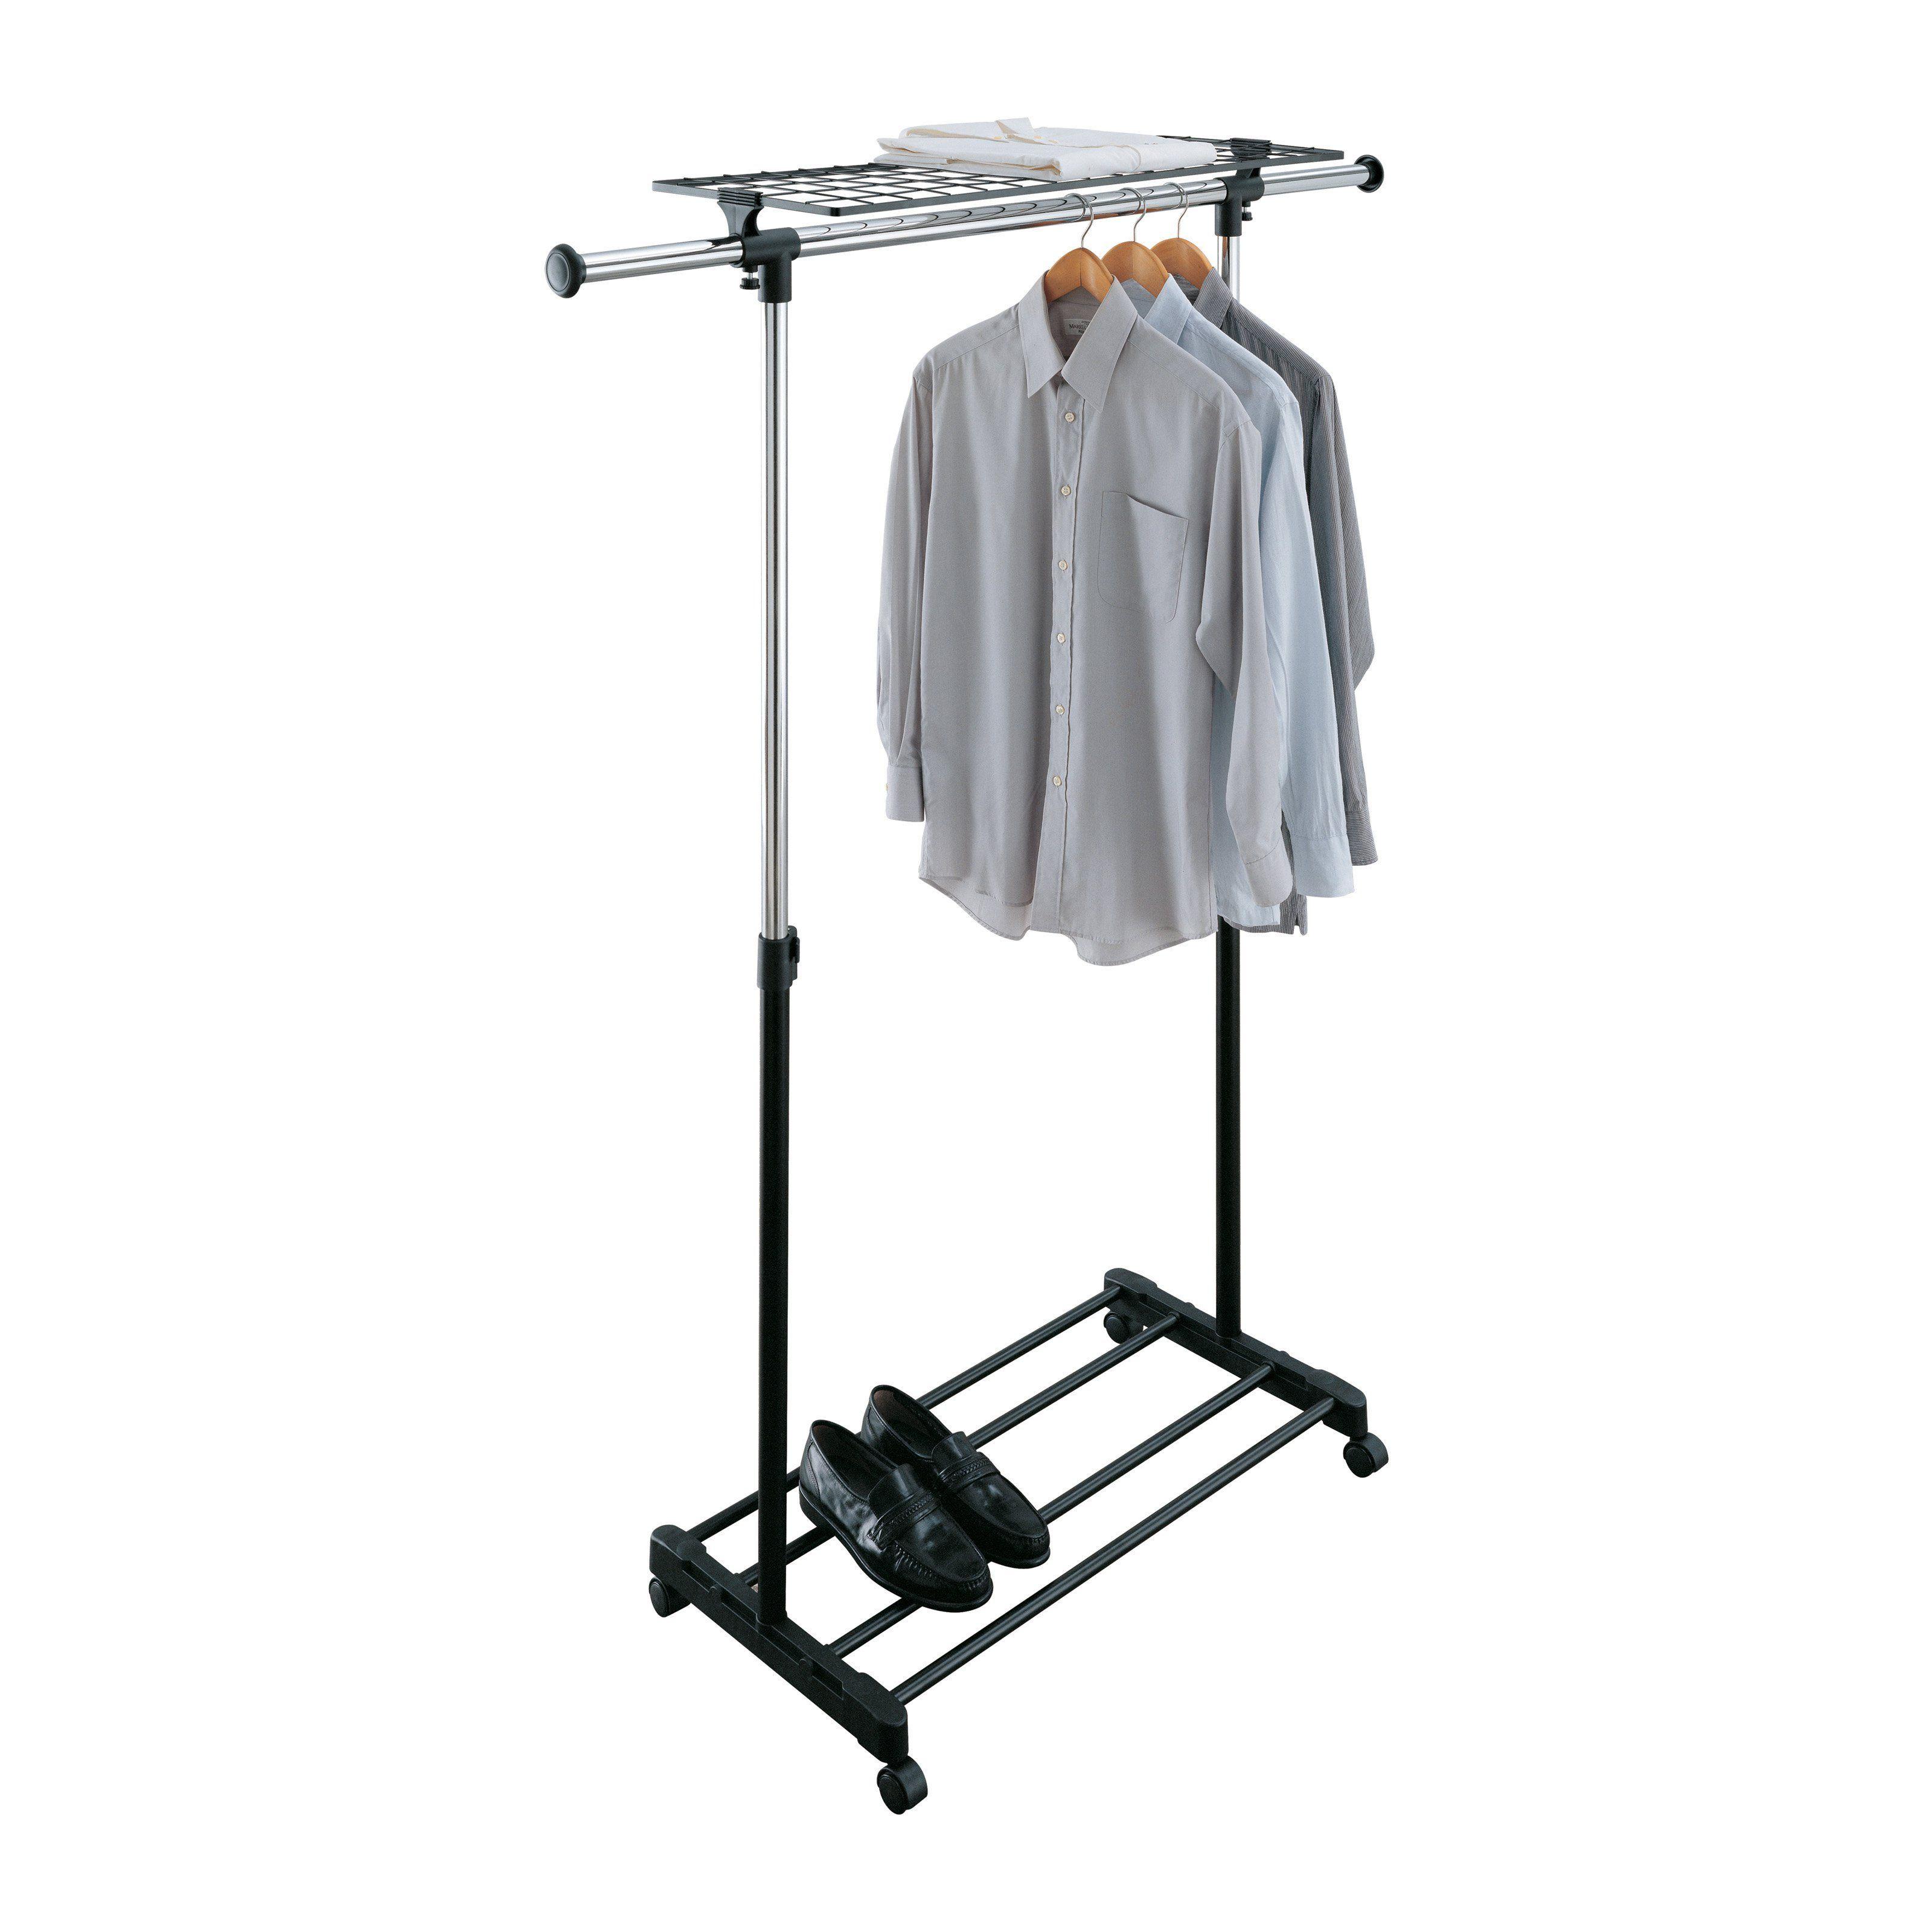 Organize it all adjustable garment rack with shelf blackchrome